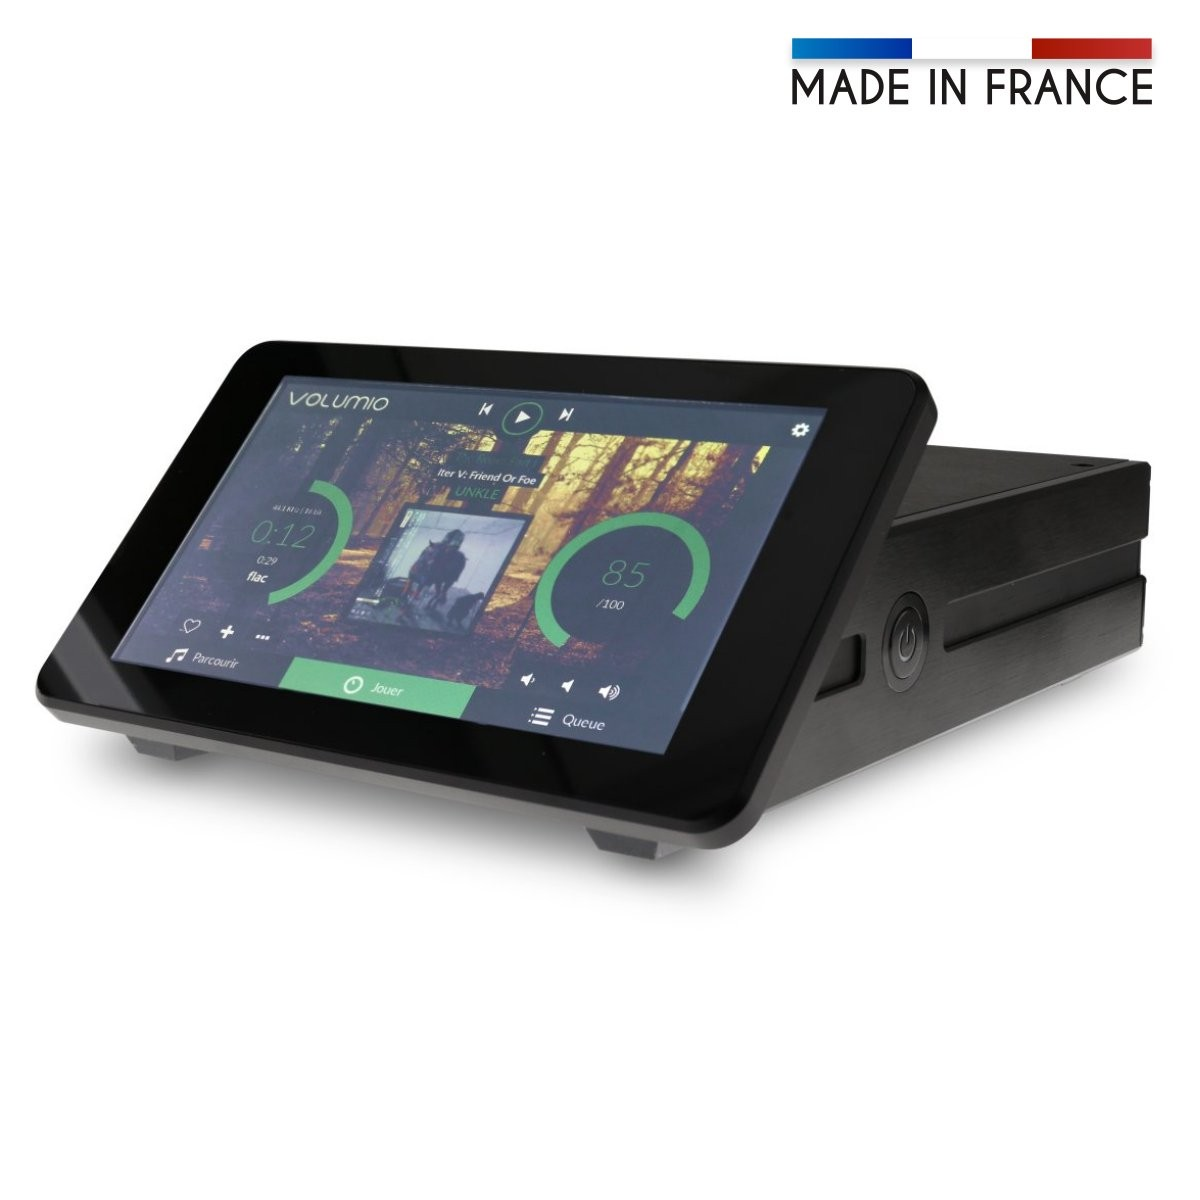 RASPTOUCH I-SABRE ES9038Q2M KALI Streamer Touchscreen with Volume Control